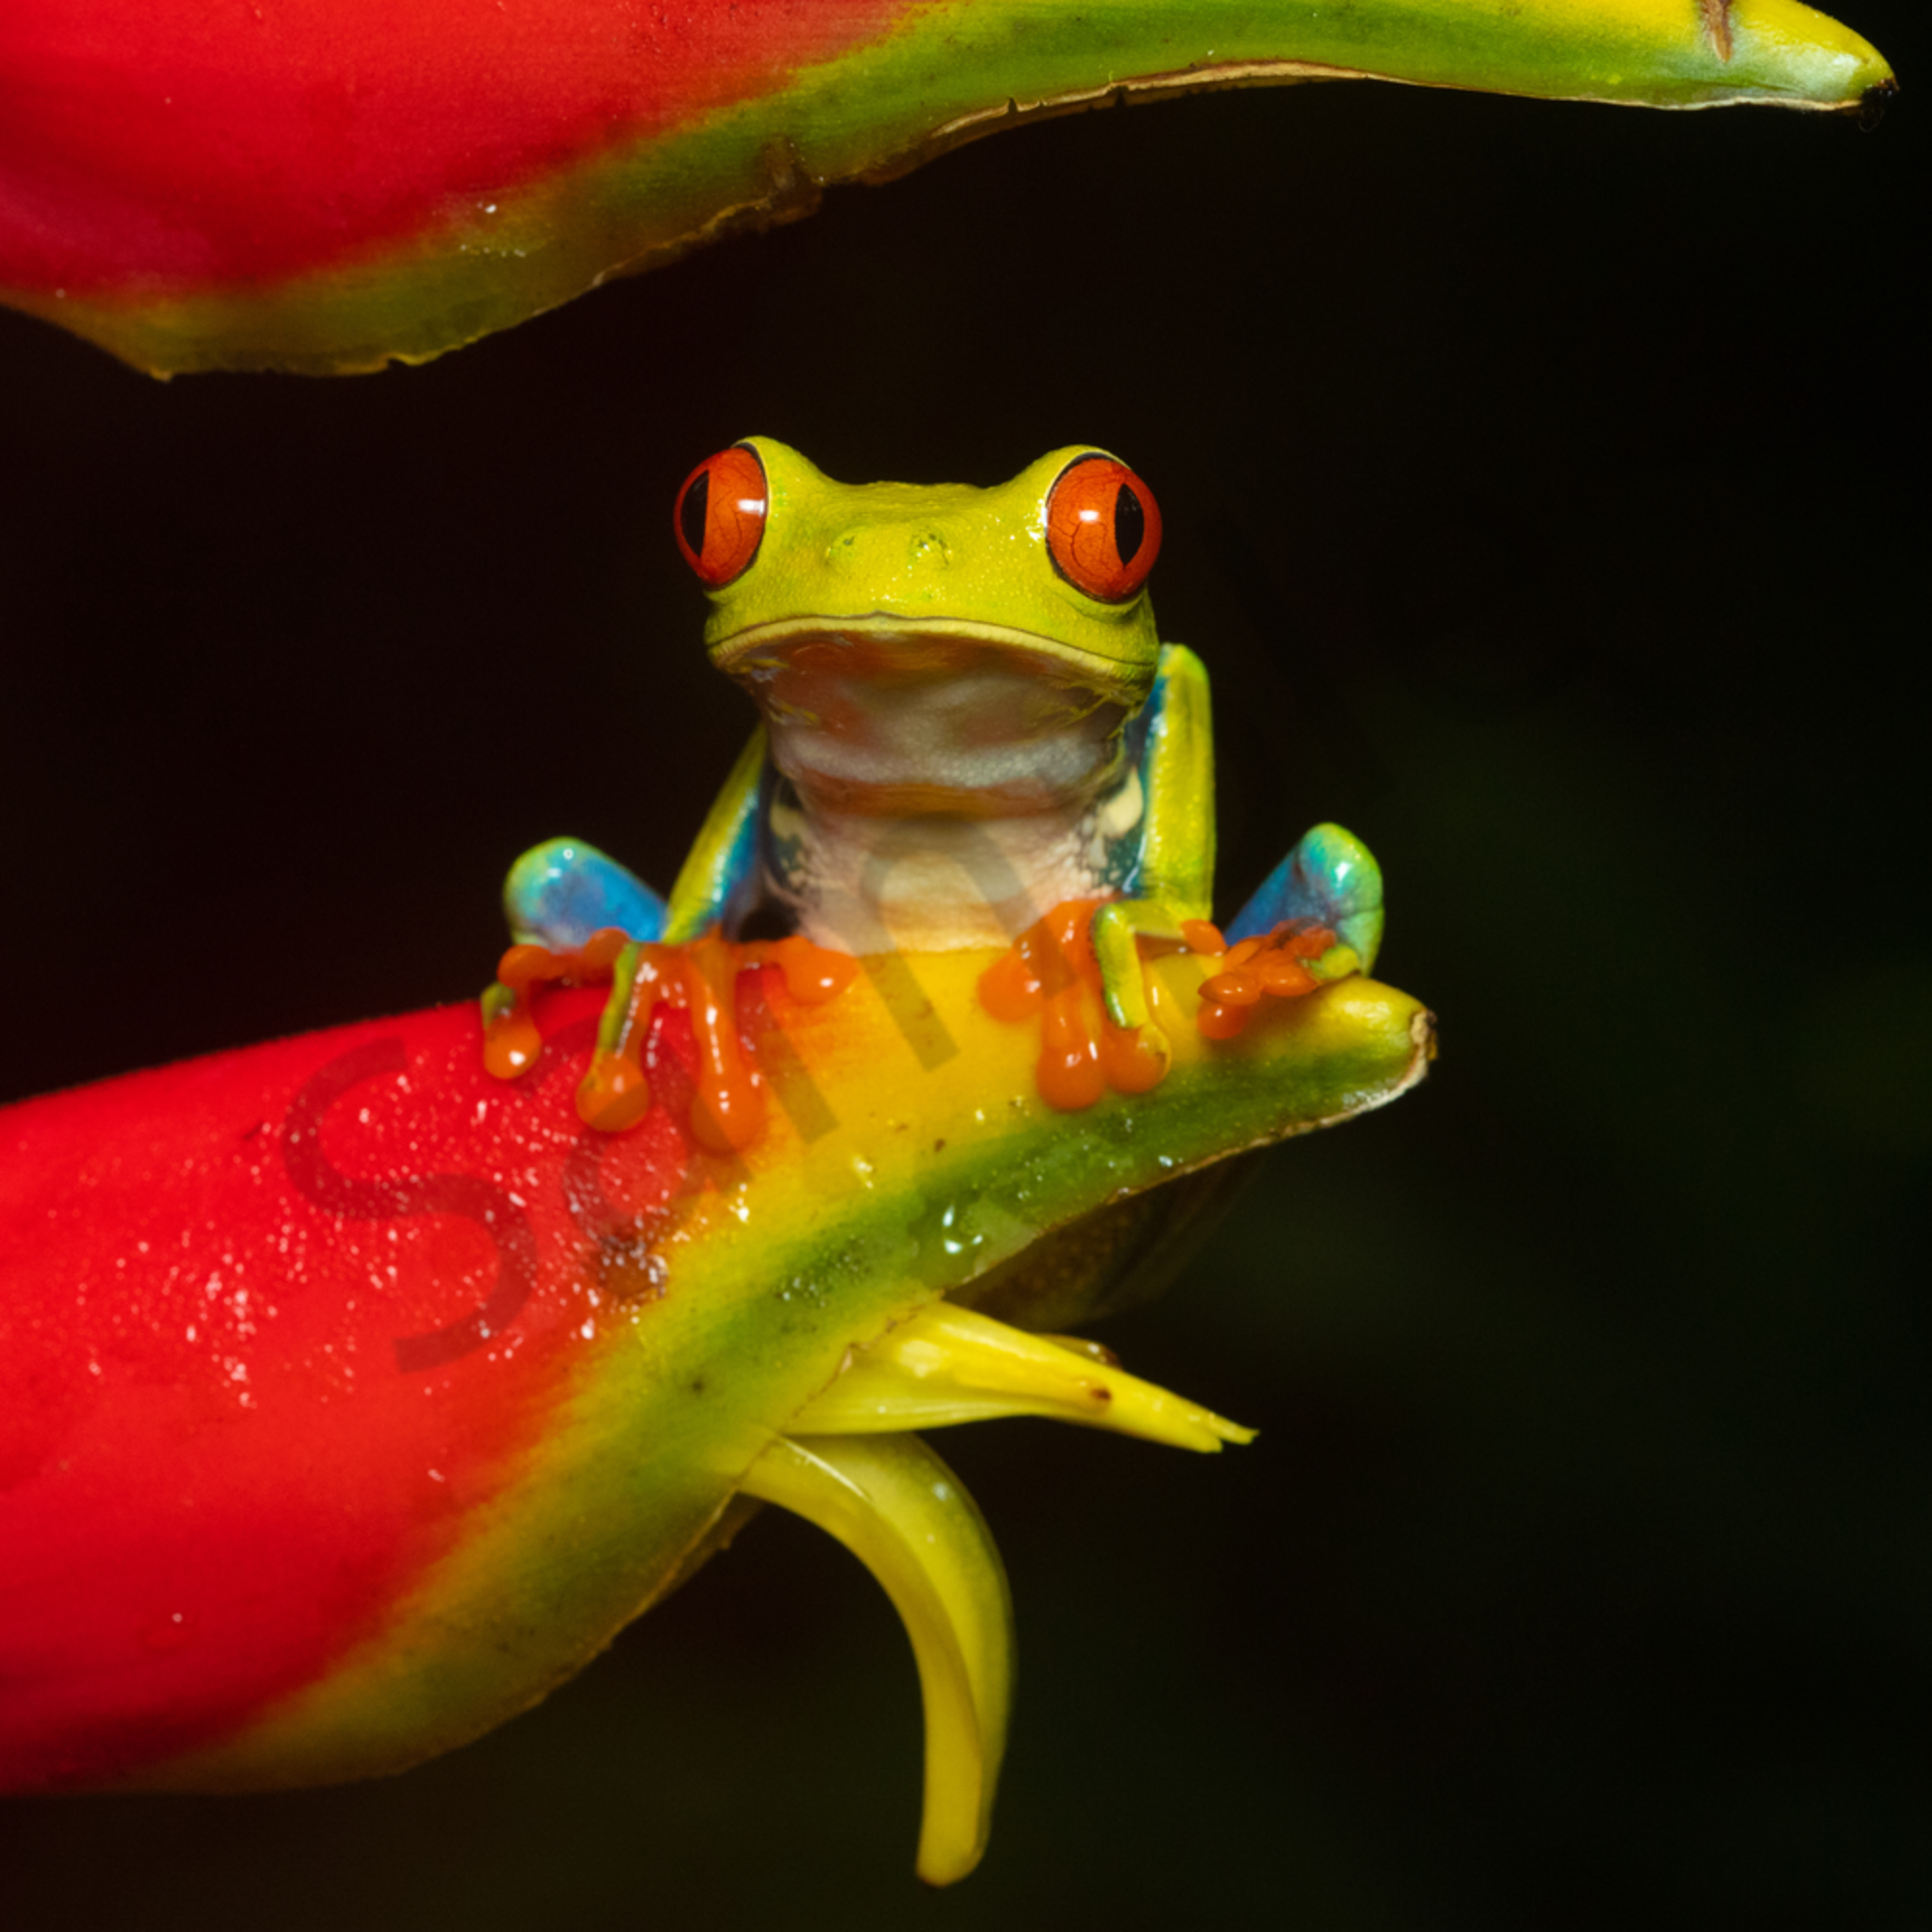 Red eyed tree frog 3 xtdrvu